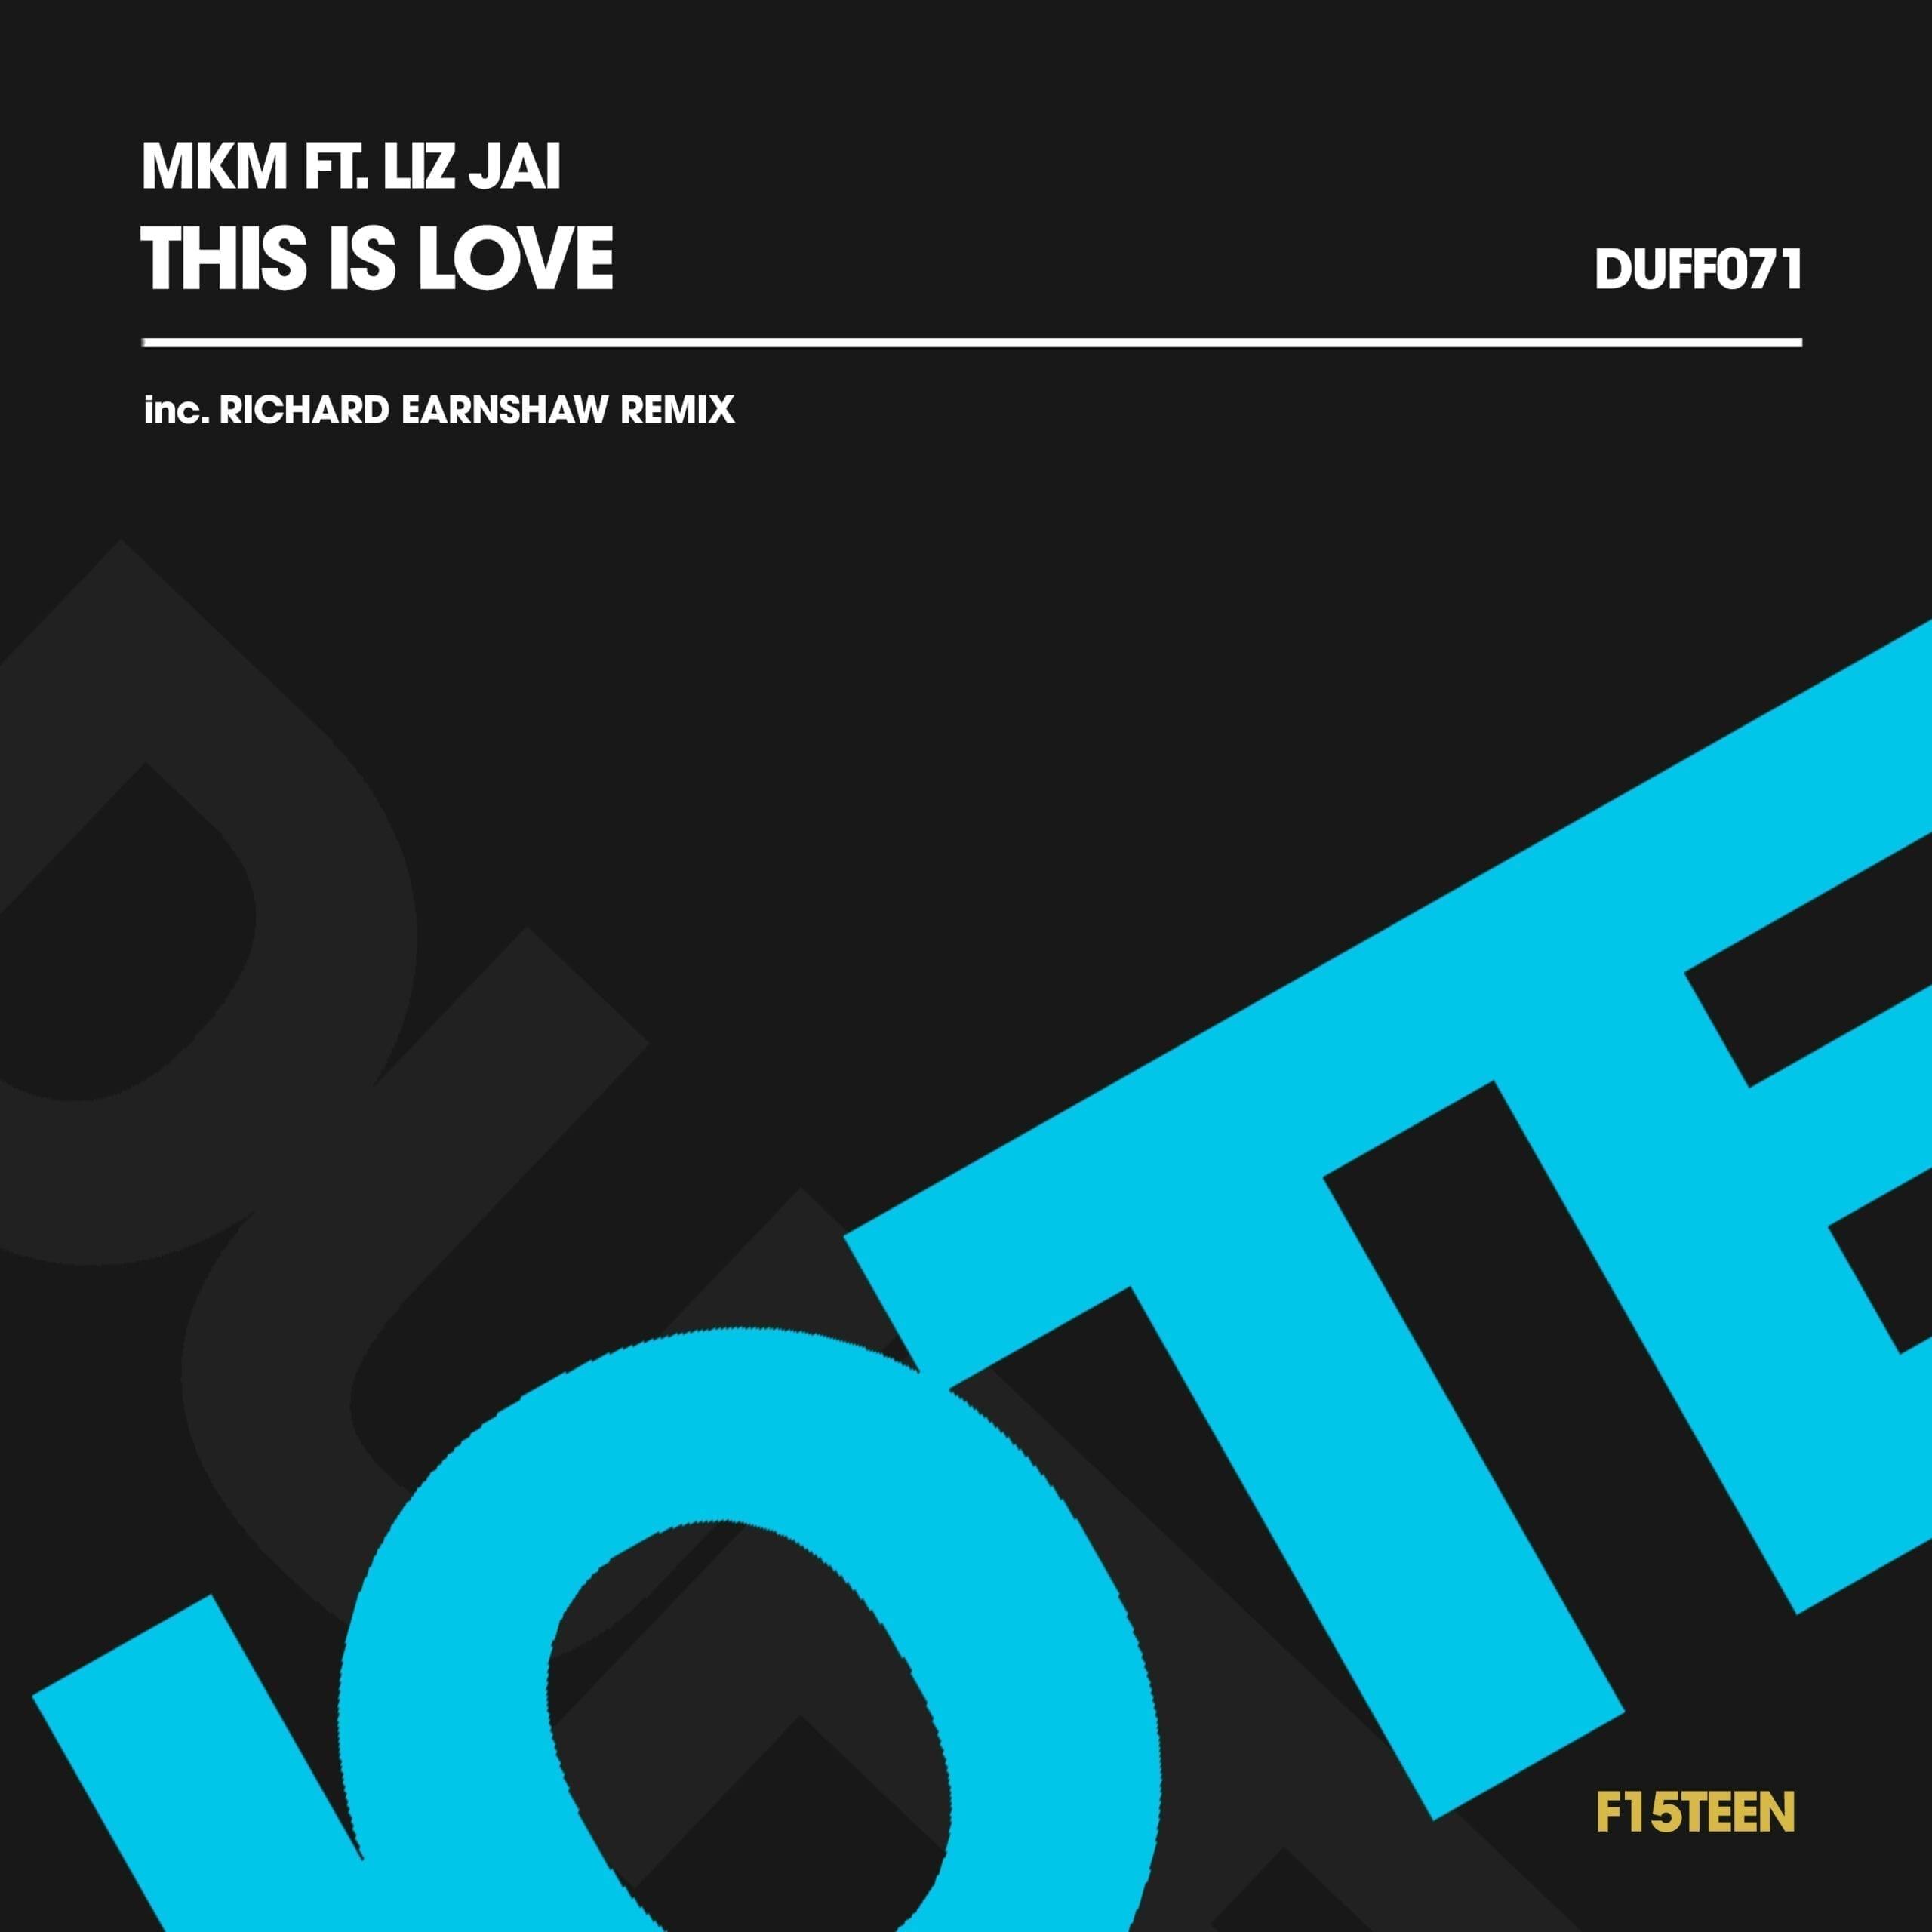 MKM ft Liz Jai 'This Is Love' (Incl. Richard Earnshaw Remix) Duffnote